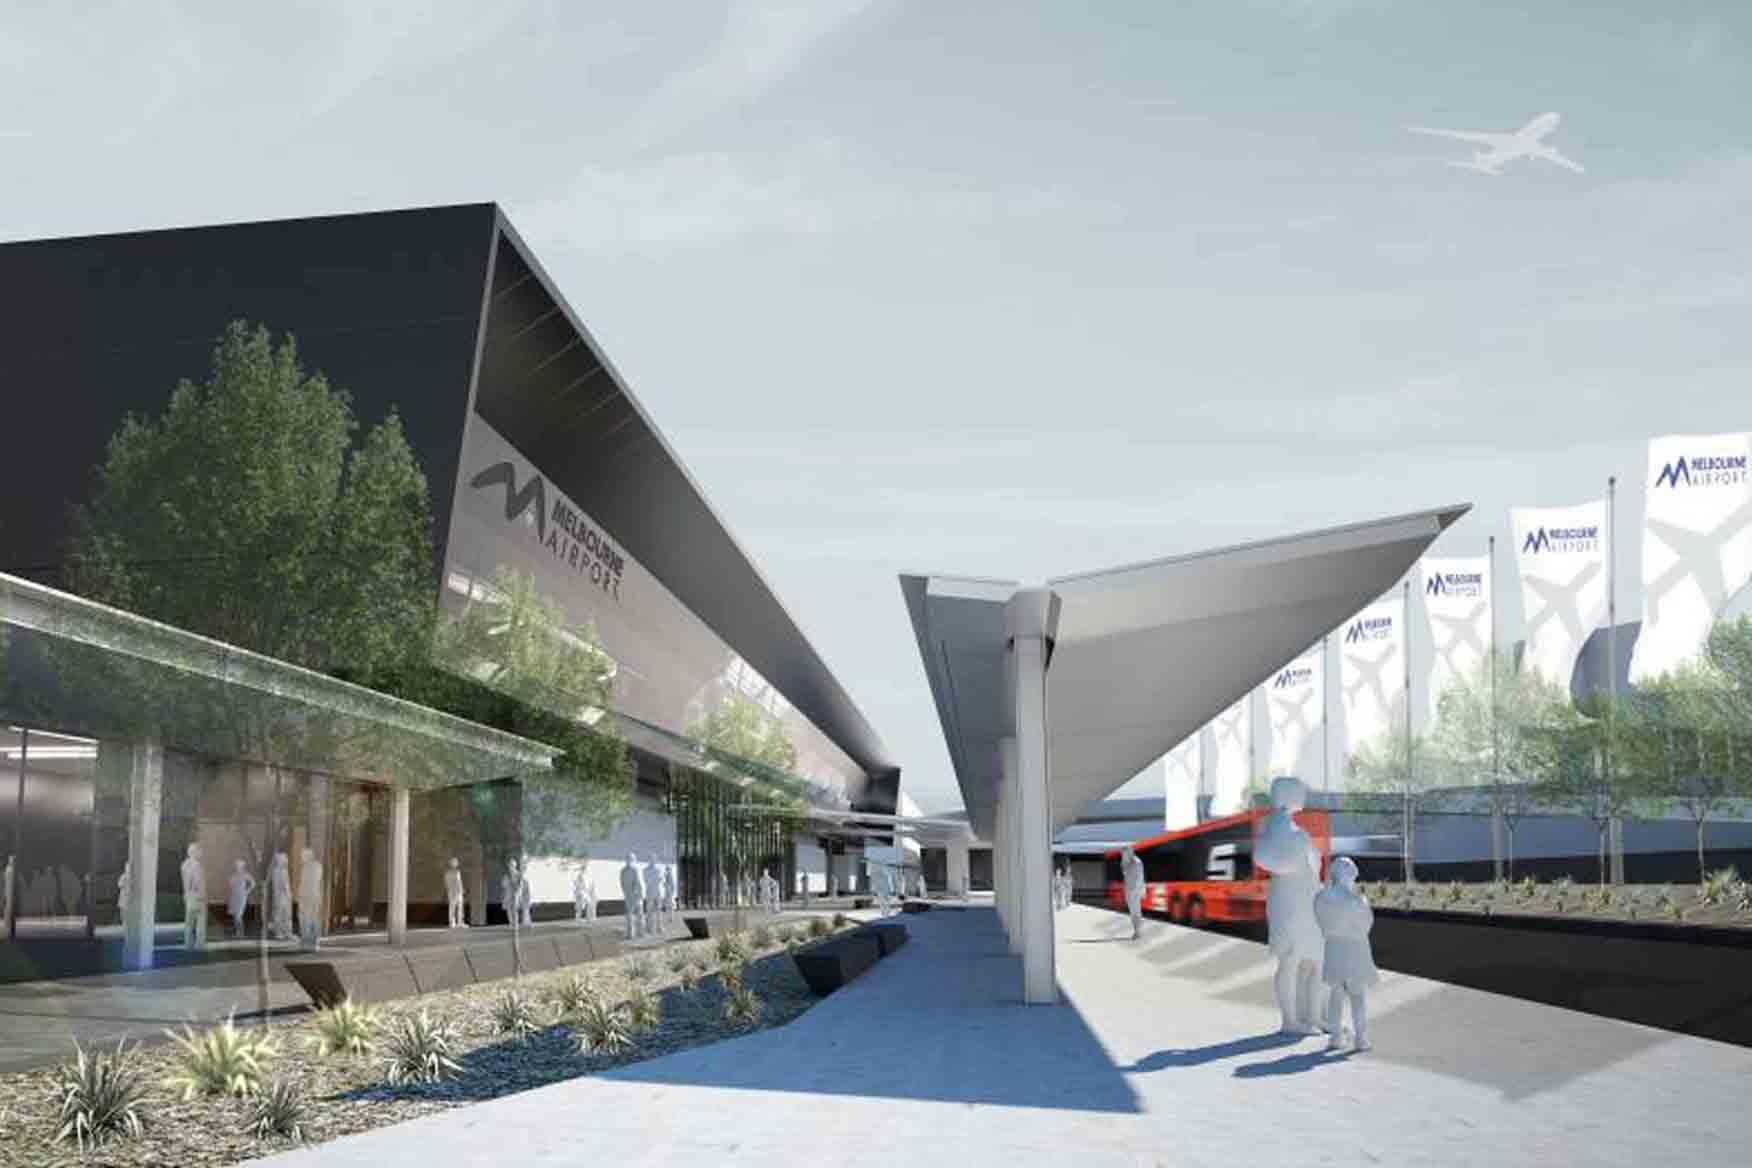 Melbourne Airport, T4